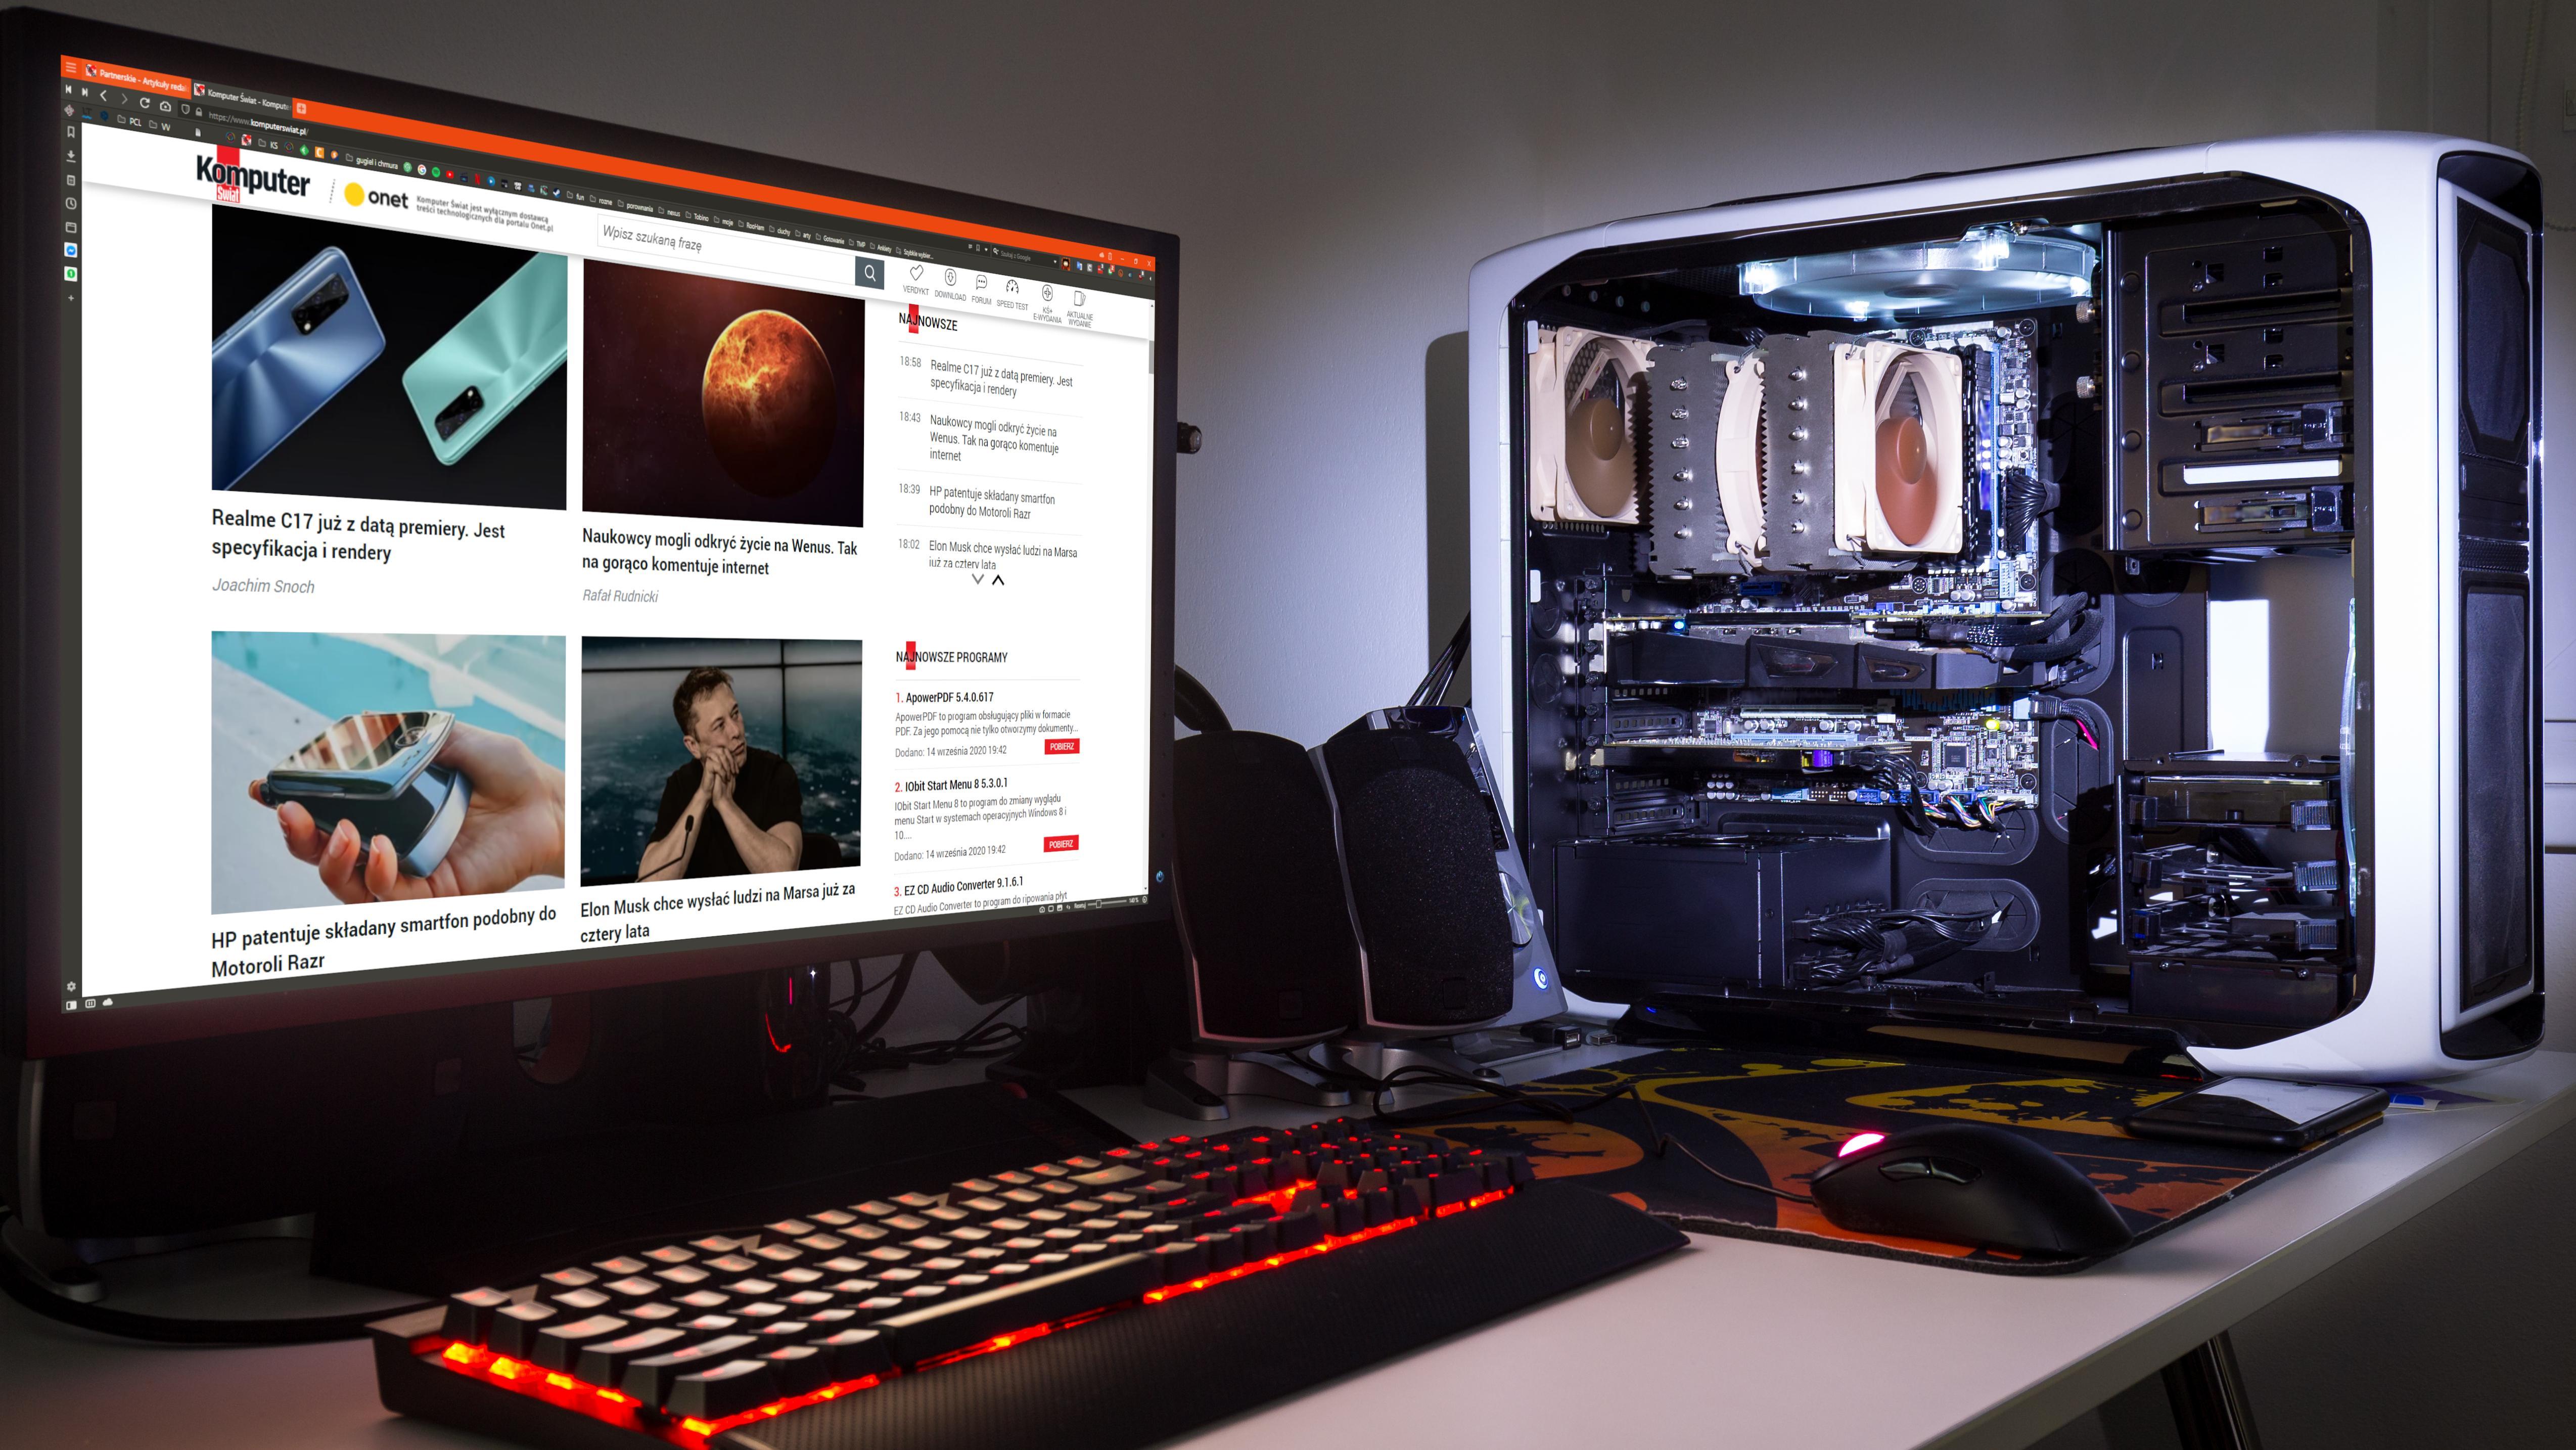 Jaki Komputer Za 4000 Zl Kupic W Marcu 2021 R